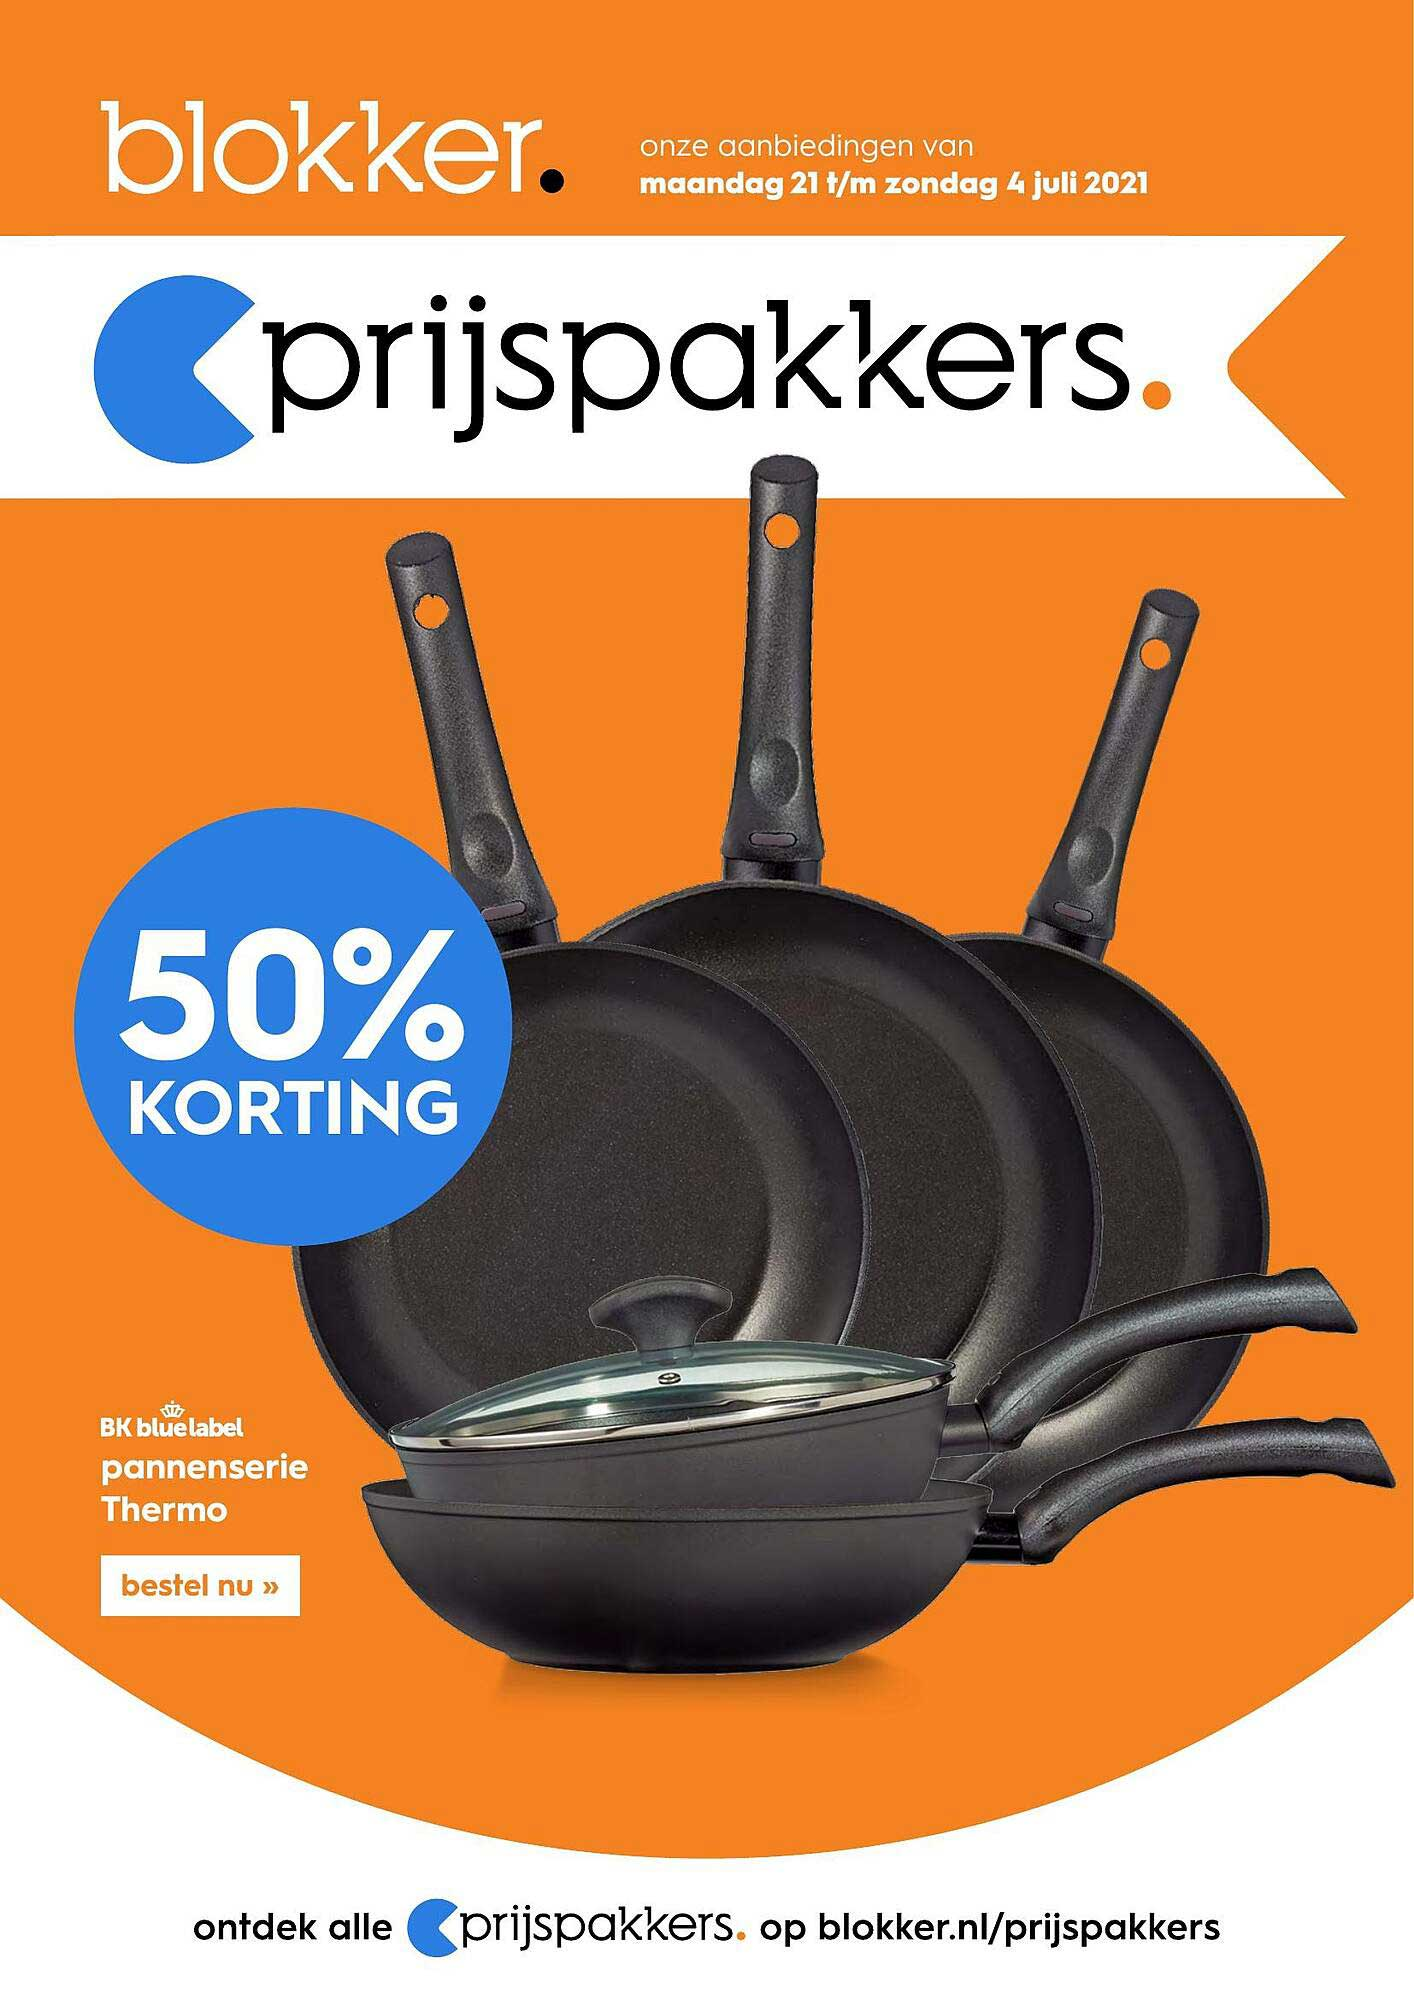 Blokker BK Blue Label Pannenserie Thermo 50% Korting